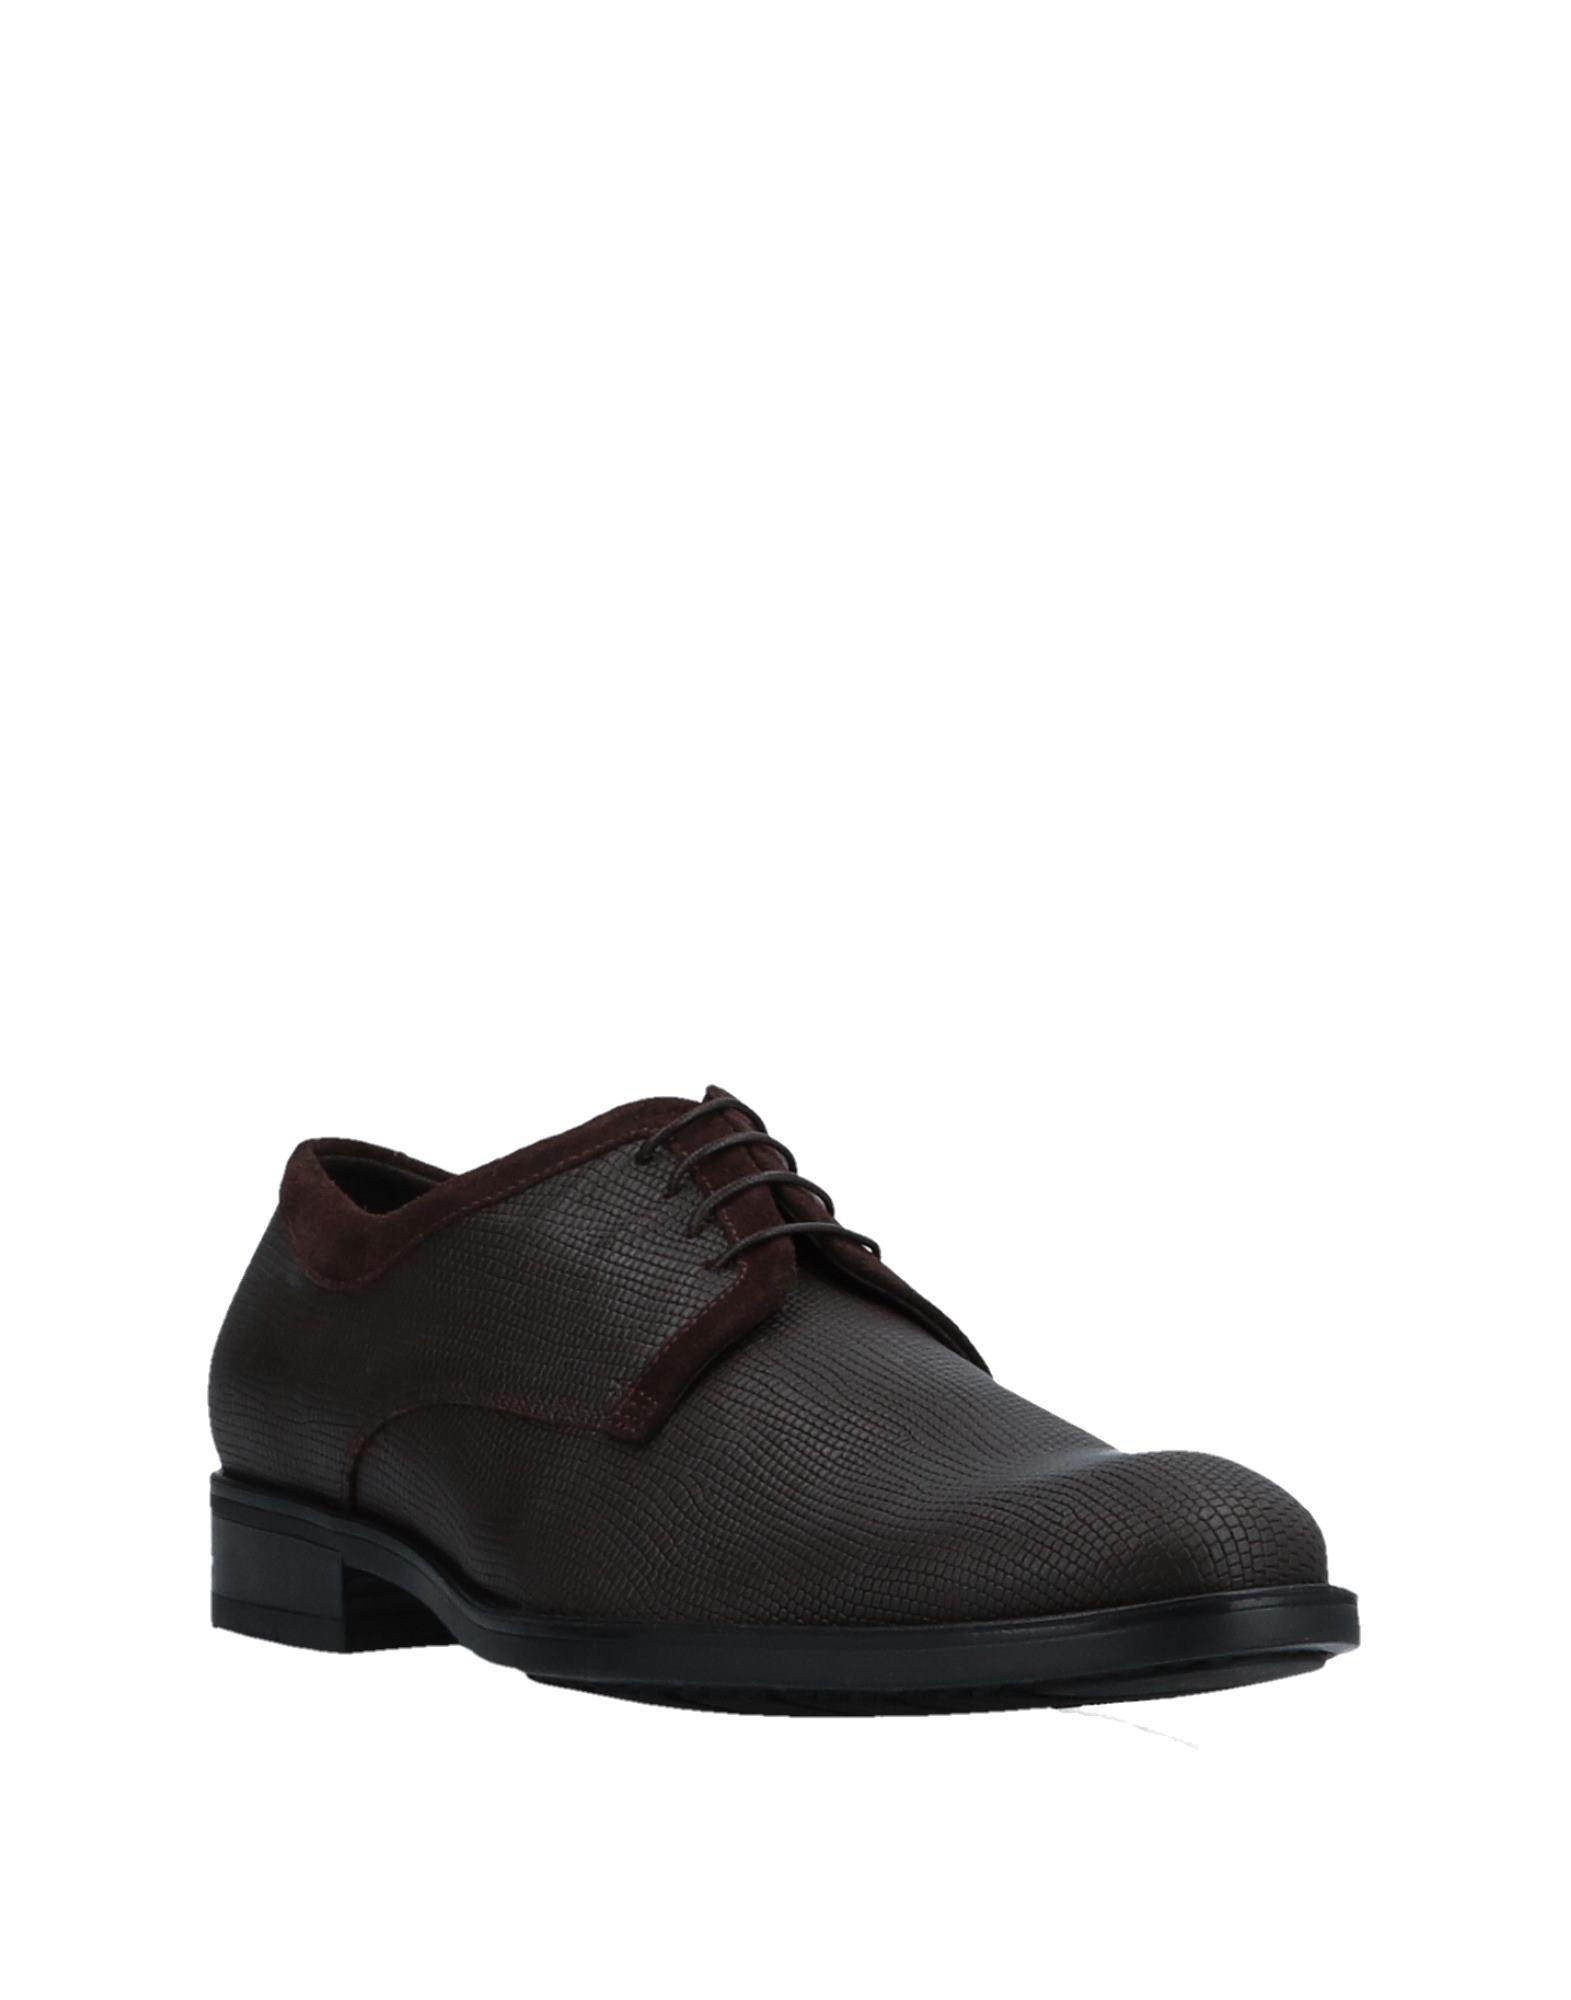 Gianfranco Lattanzi Schnürschuhe Herren  11510526CI Gute Qualität beliebte Schuhe